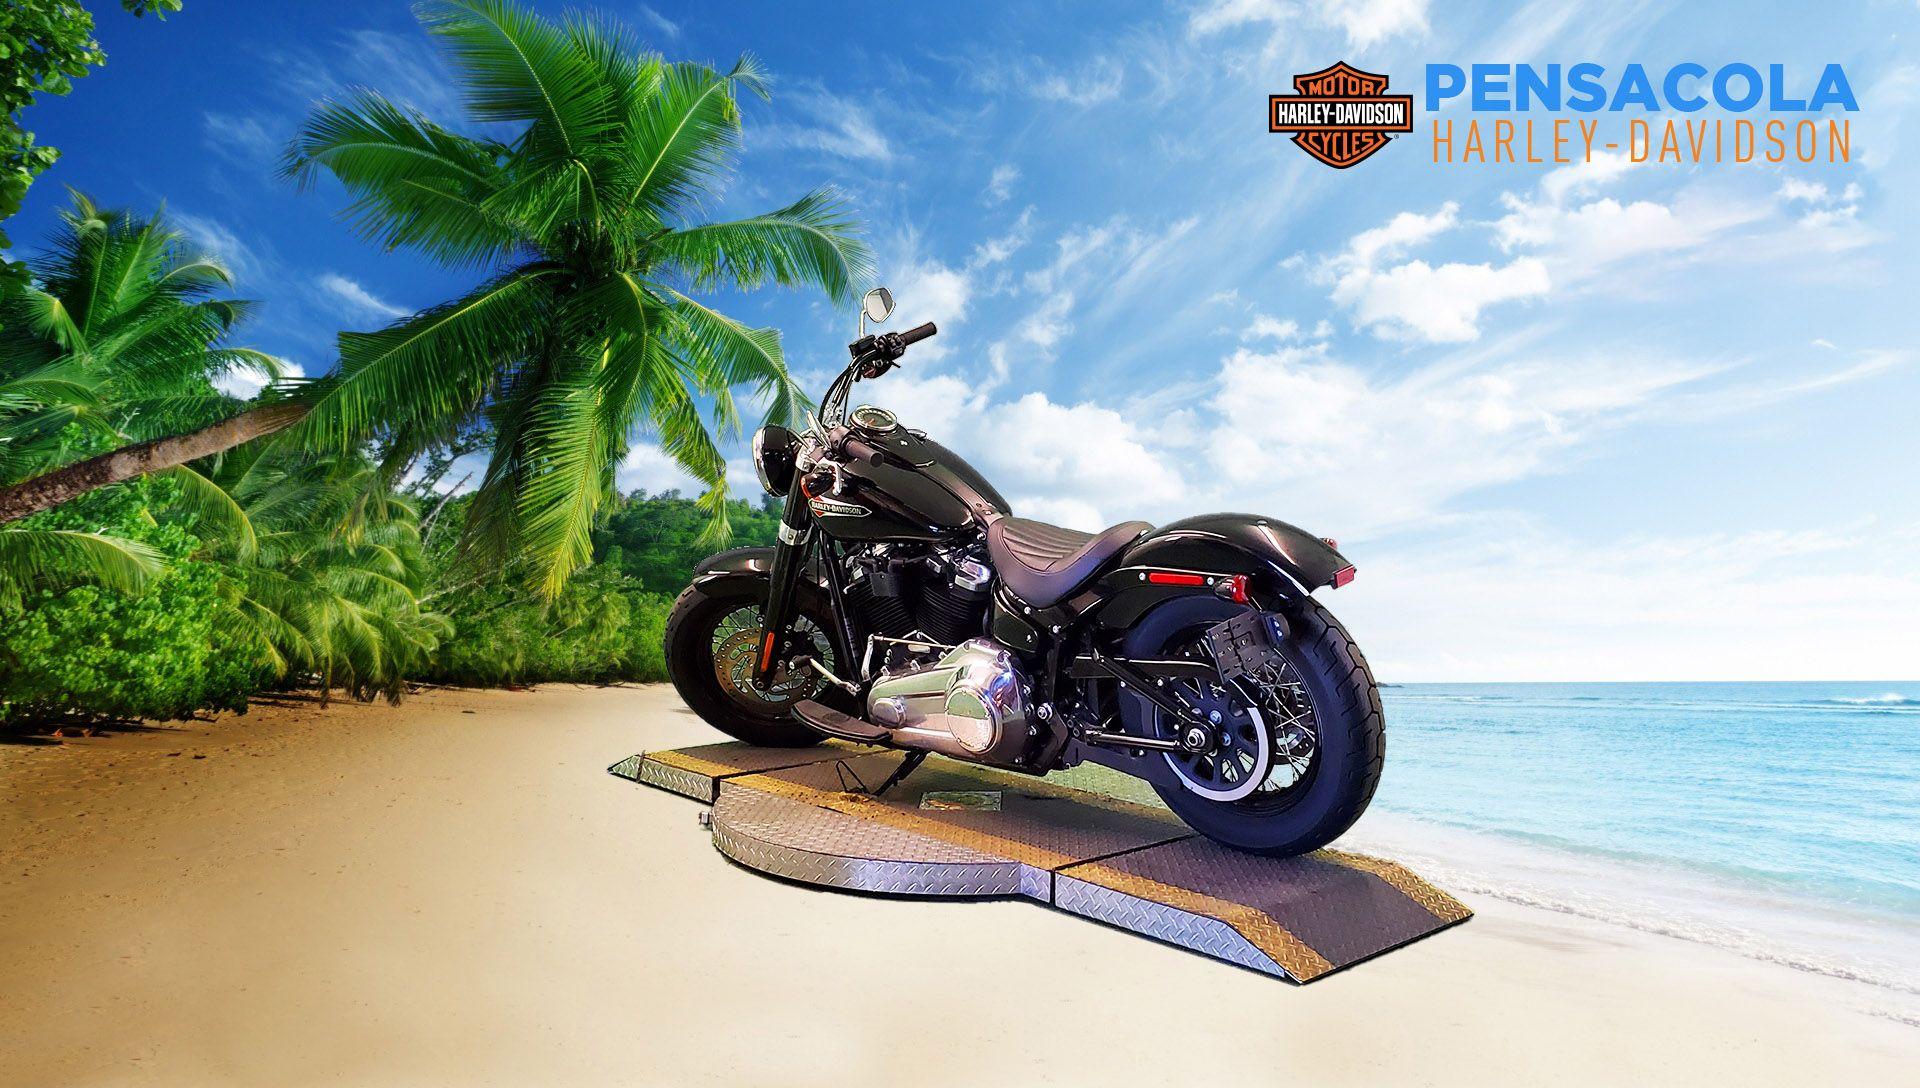 Pre-Owned 2020 Harley-Davidson Softail Slim FLSL